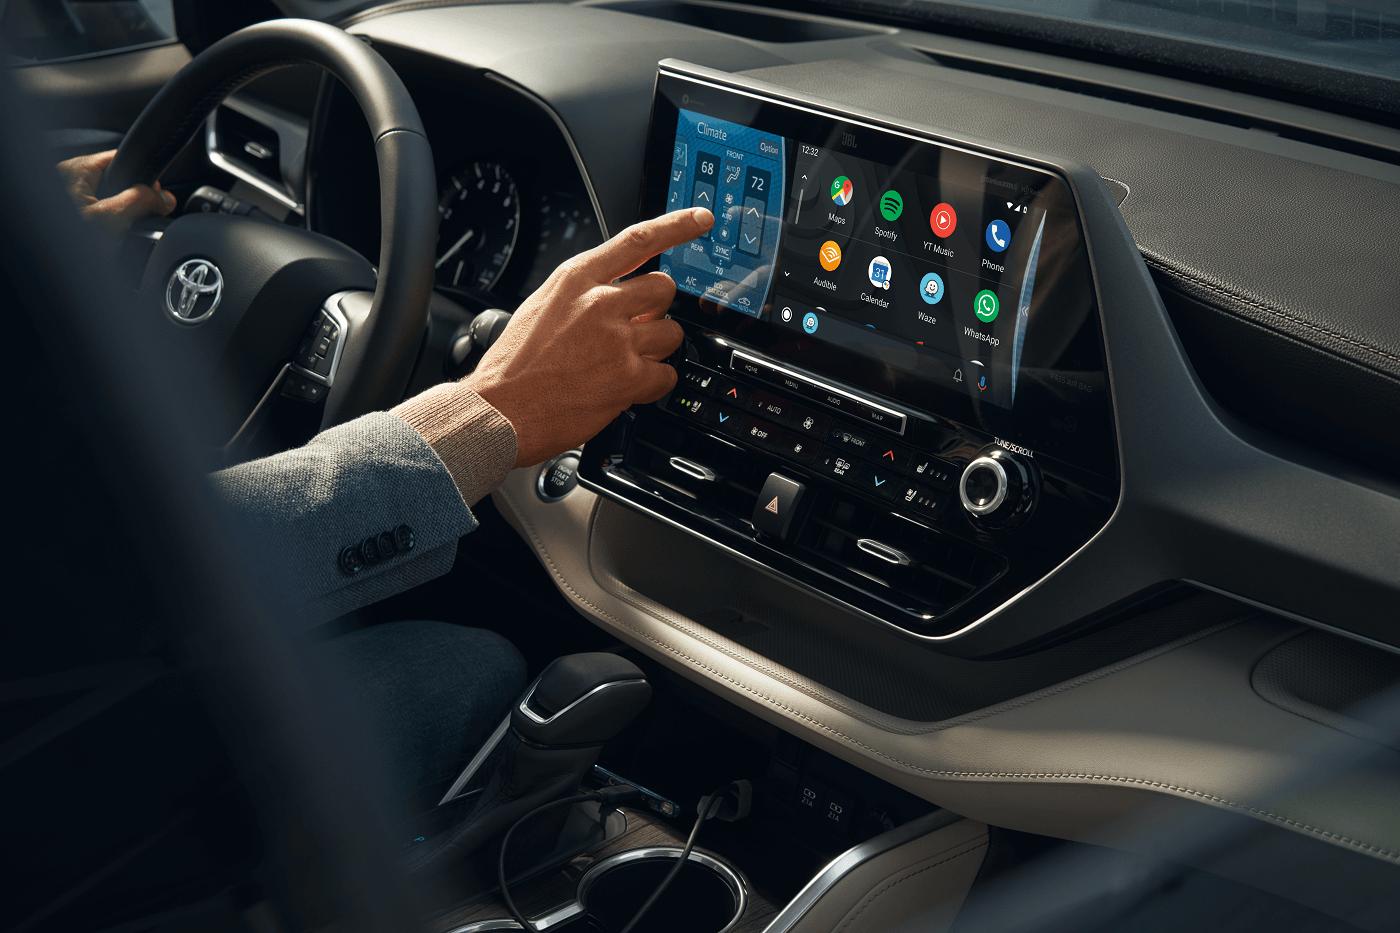 2020 Toyota Highlander Infotainment